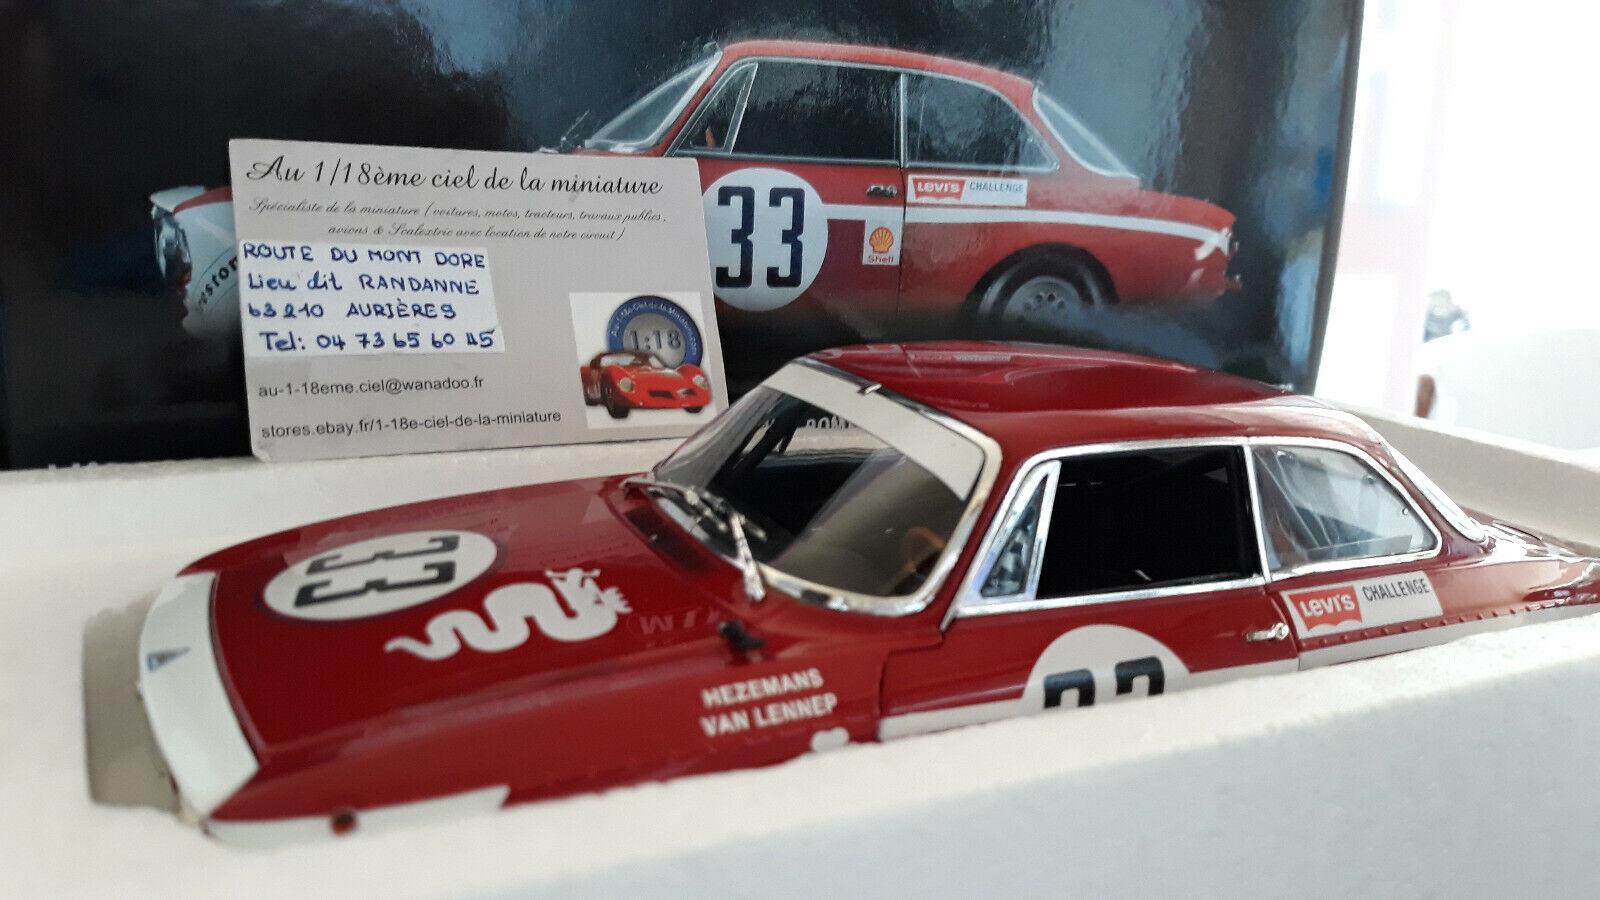 ALFA ROMEO GTA 1300 JUNIOR 1972 rge   33 LENNEP JARAMA 1 18 Minichamps 100721233